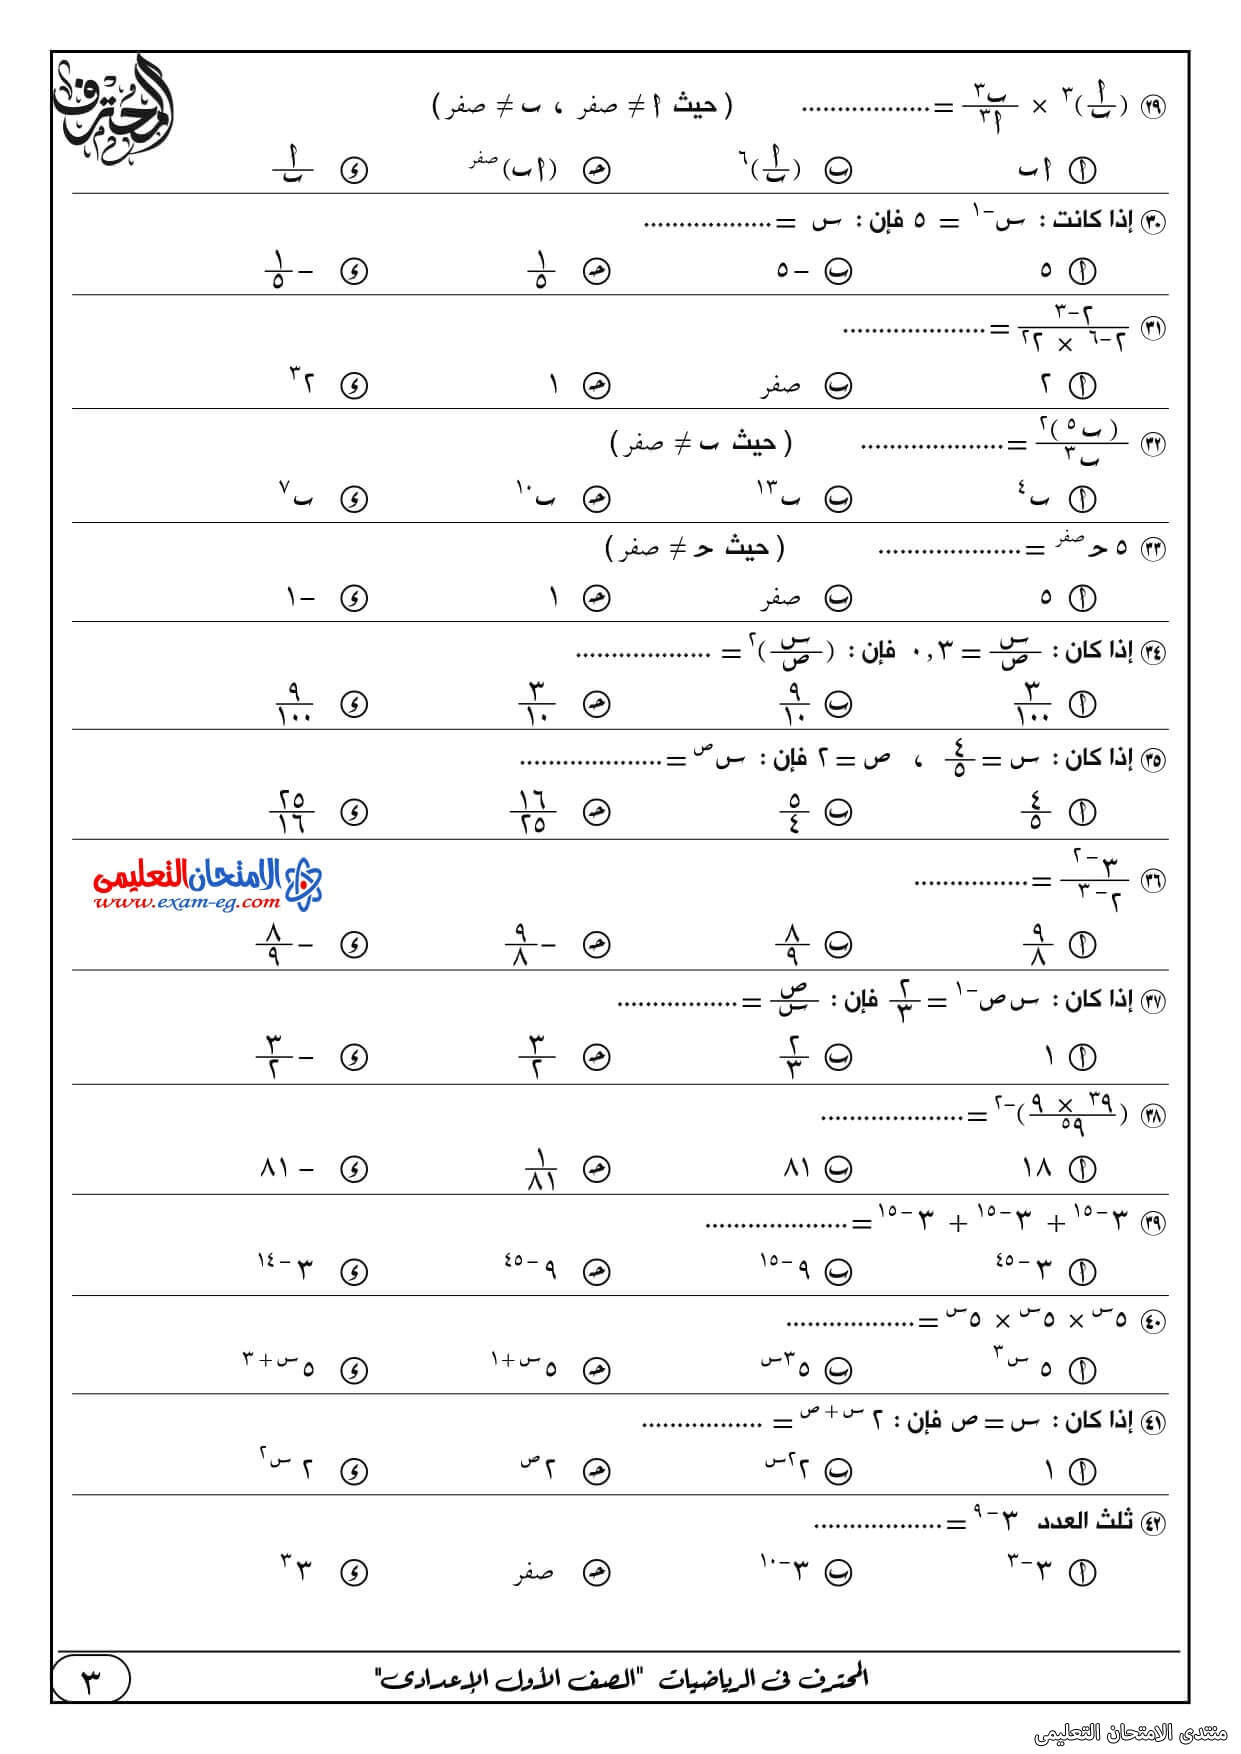 exam-eg.com_161688555009073.jpg